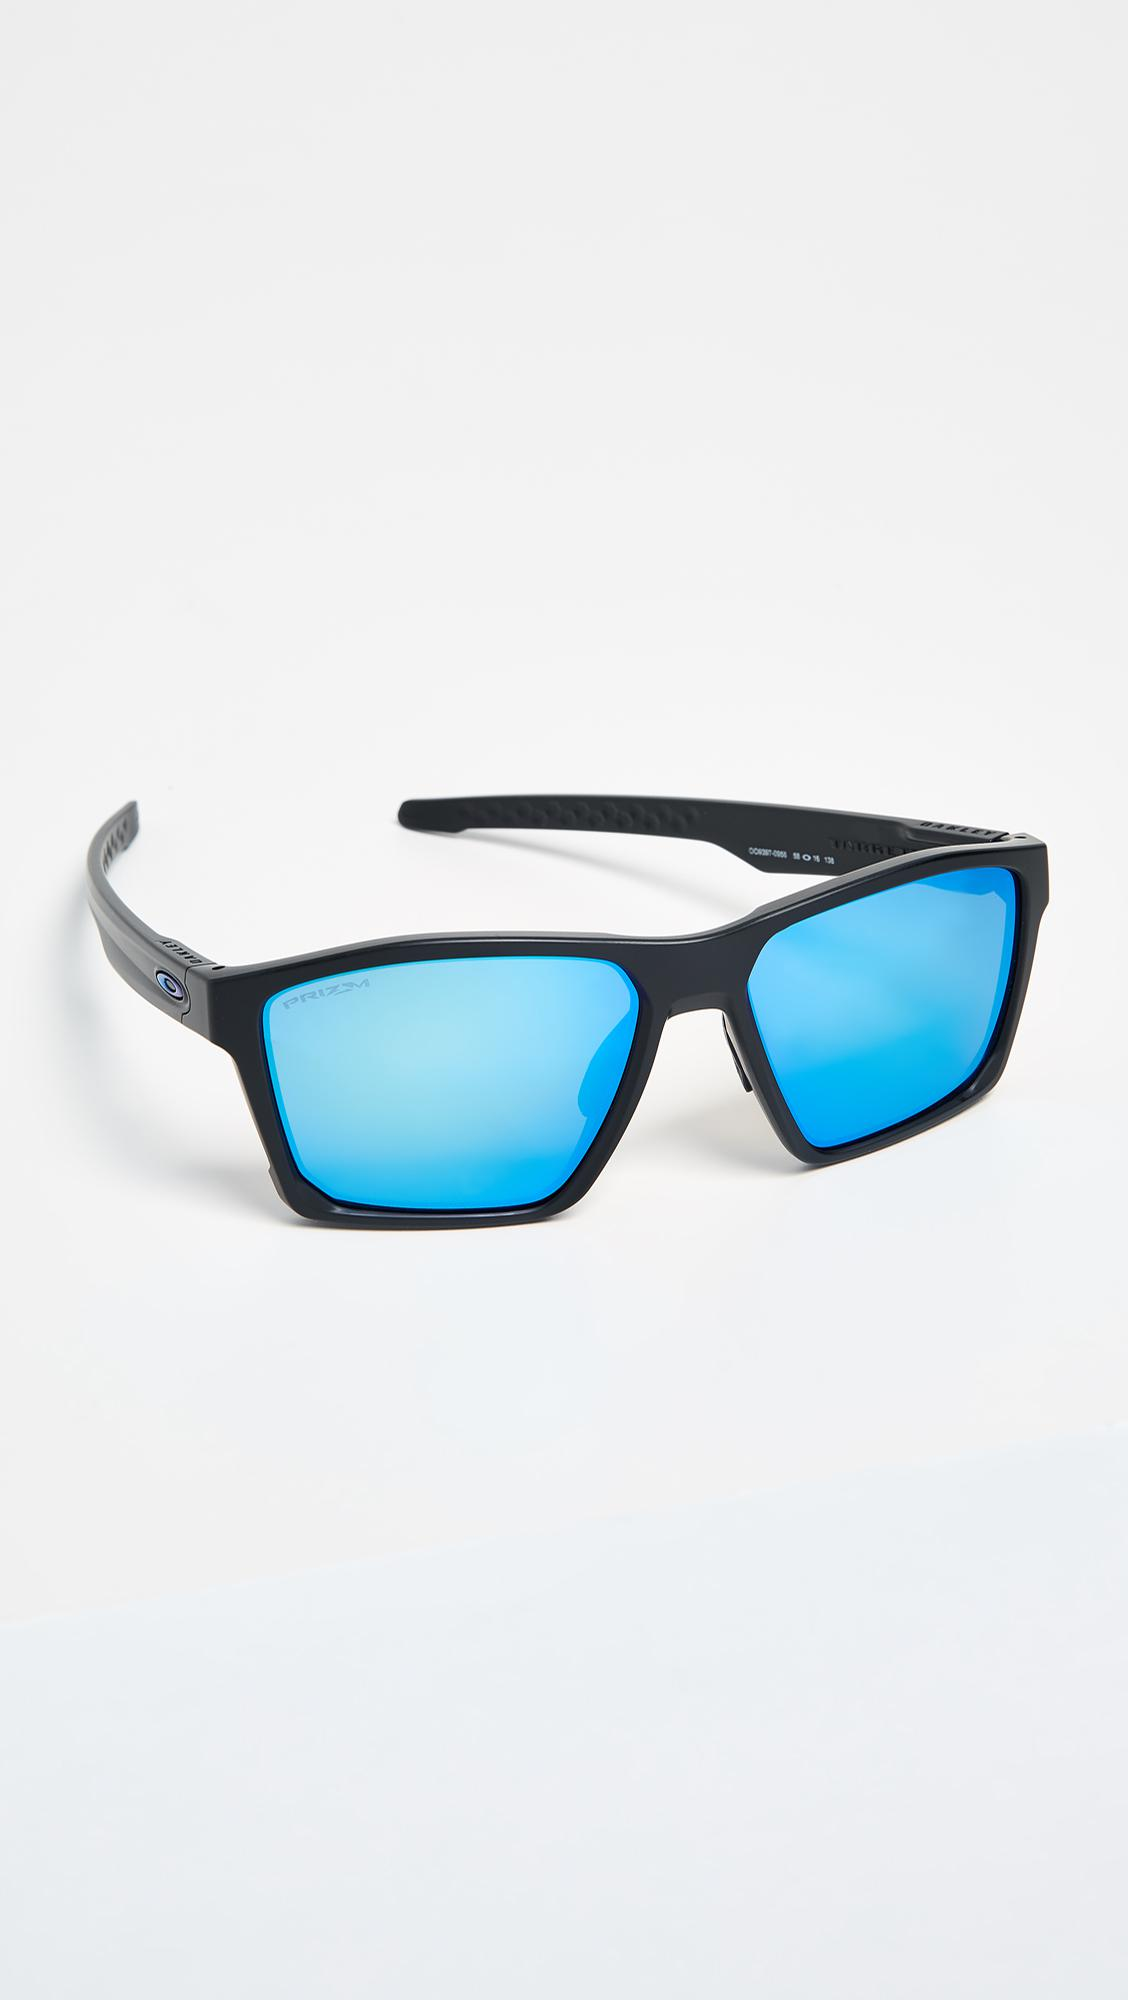 5ff81157ed963 Oakley - Blue Holbrook Prizm Sunglasses for Men - Lyst. View fullscreen